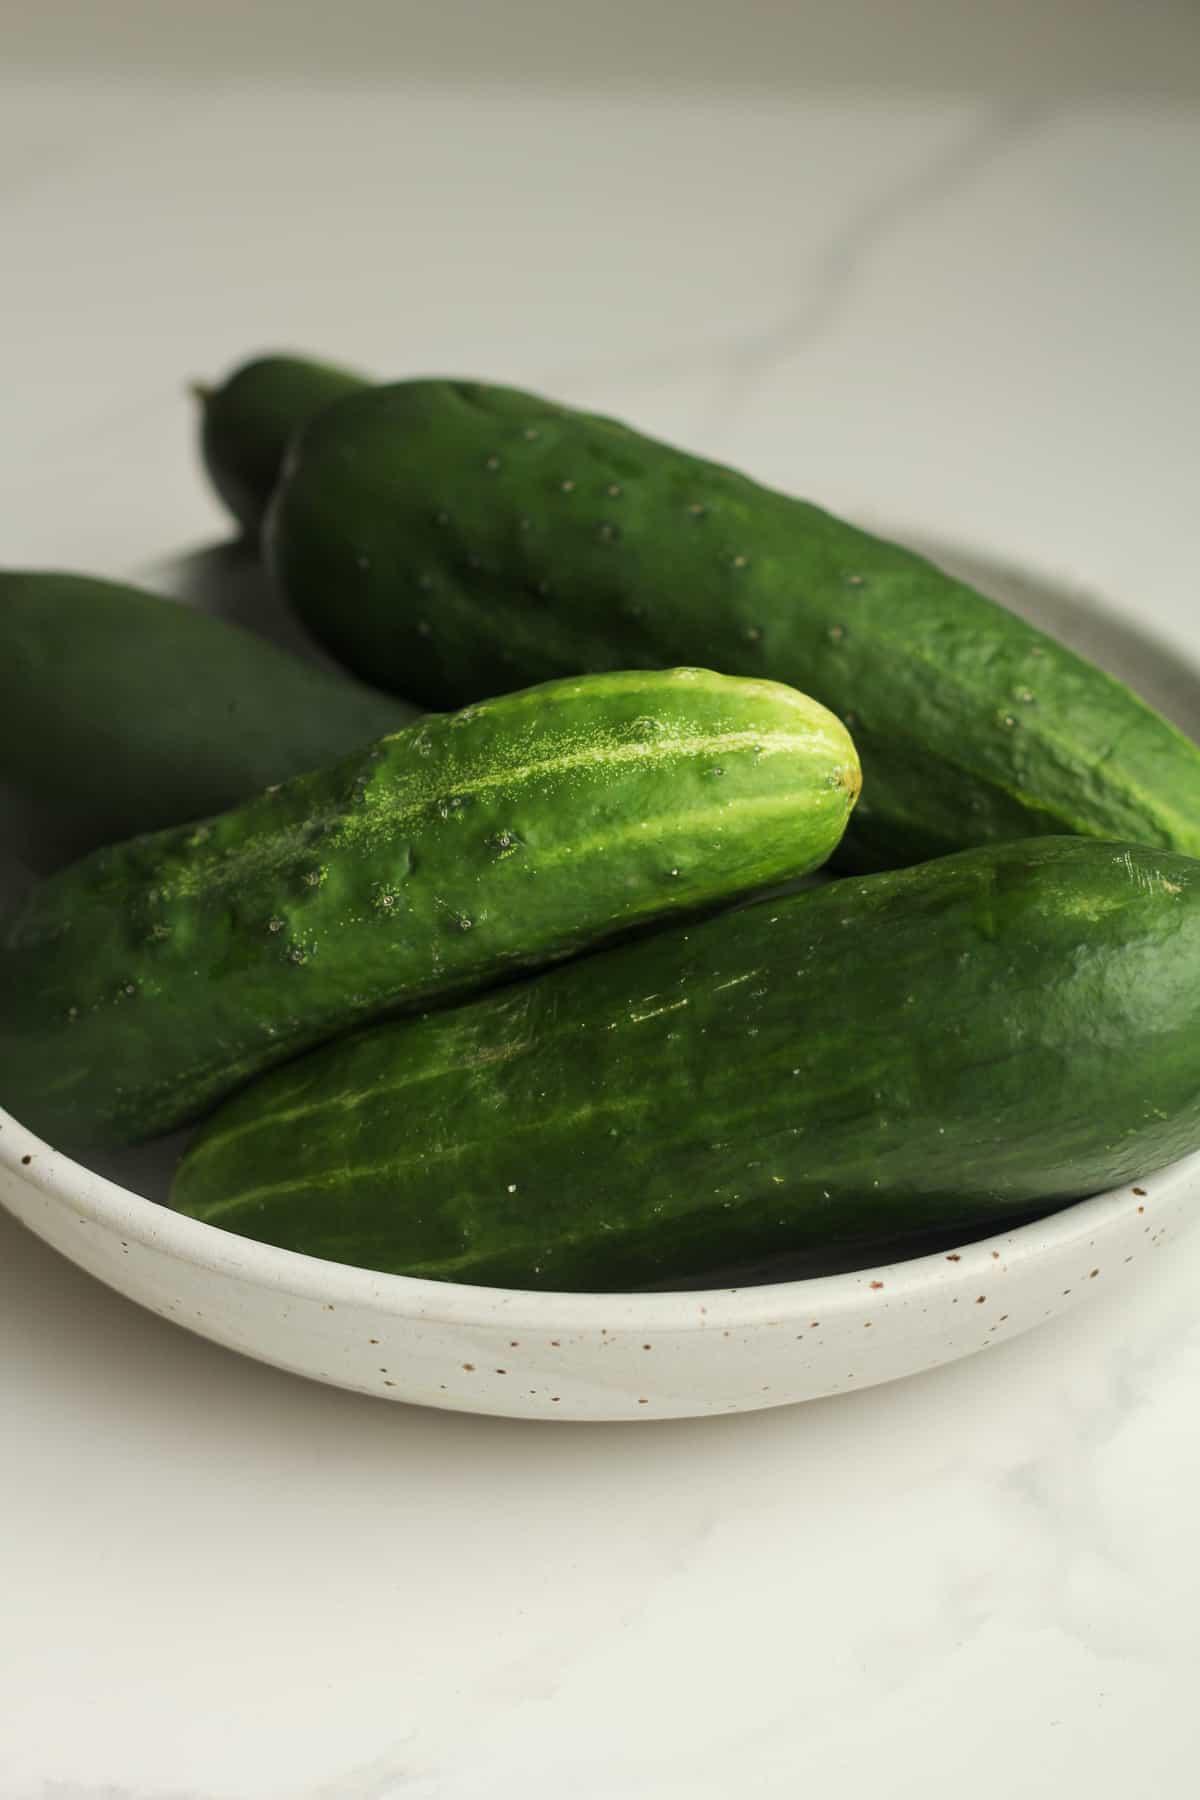 Ak bowl of cucumbers.